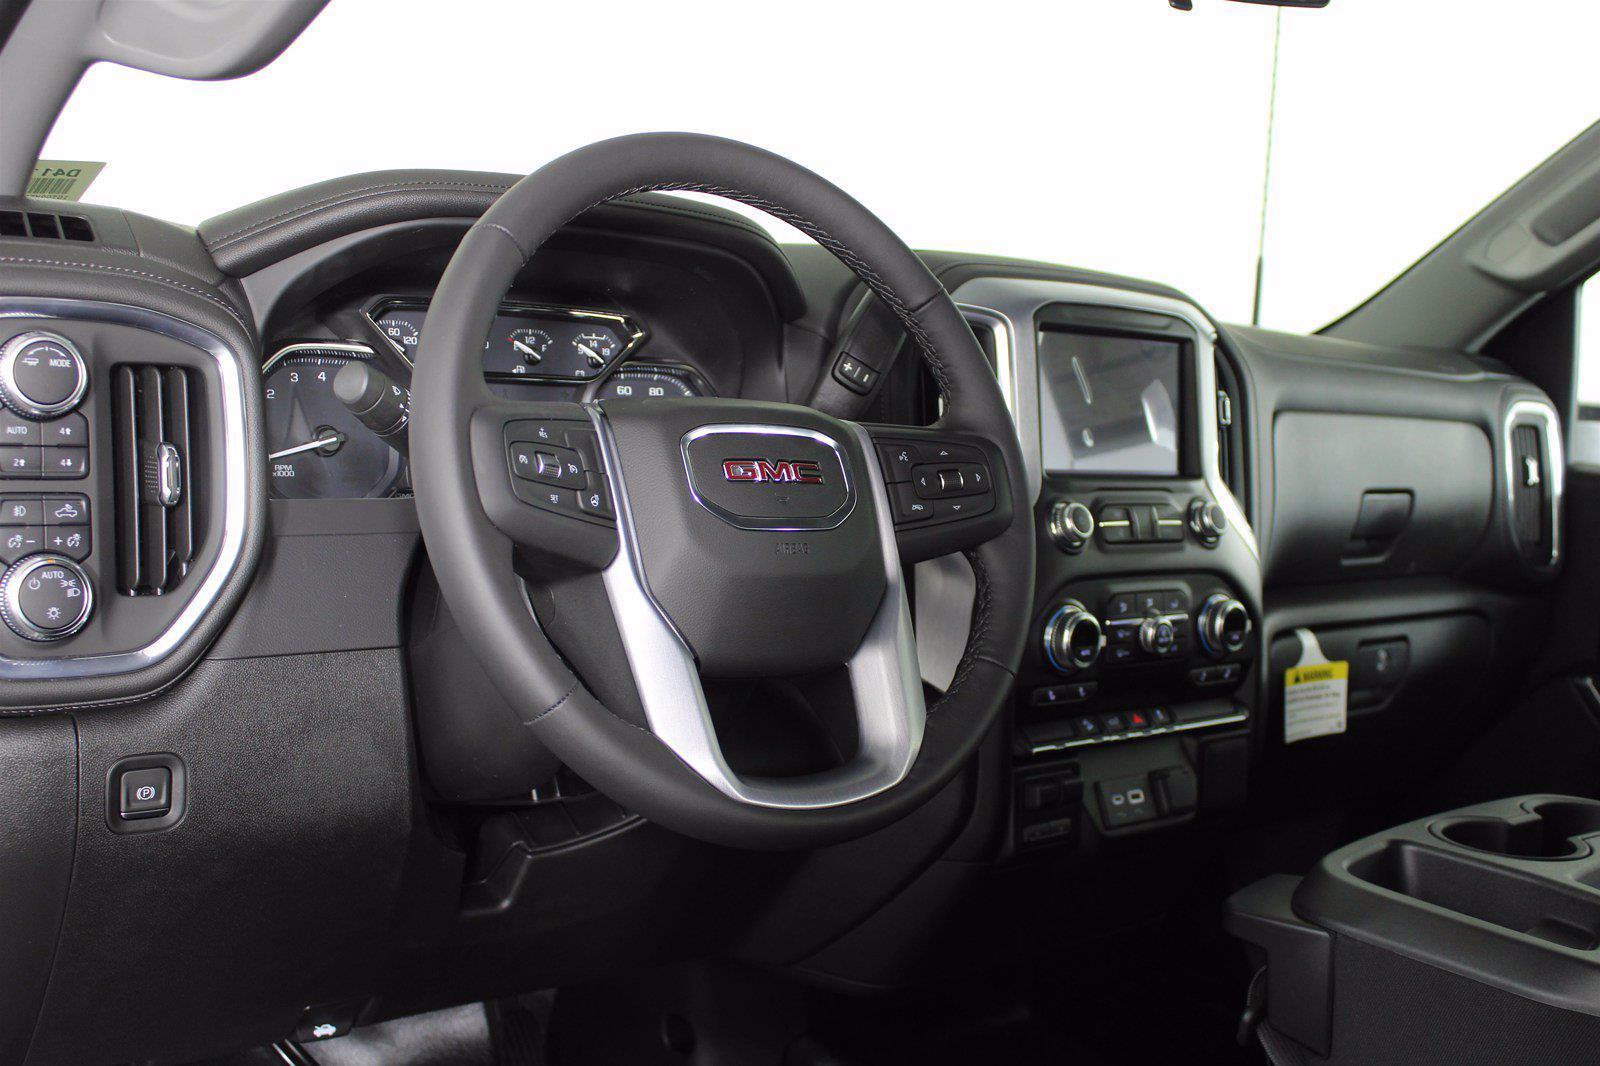 2021 GMC Sierra 2500 Regular Cab 4x4, Pickup #D411067 - photo 9